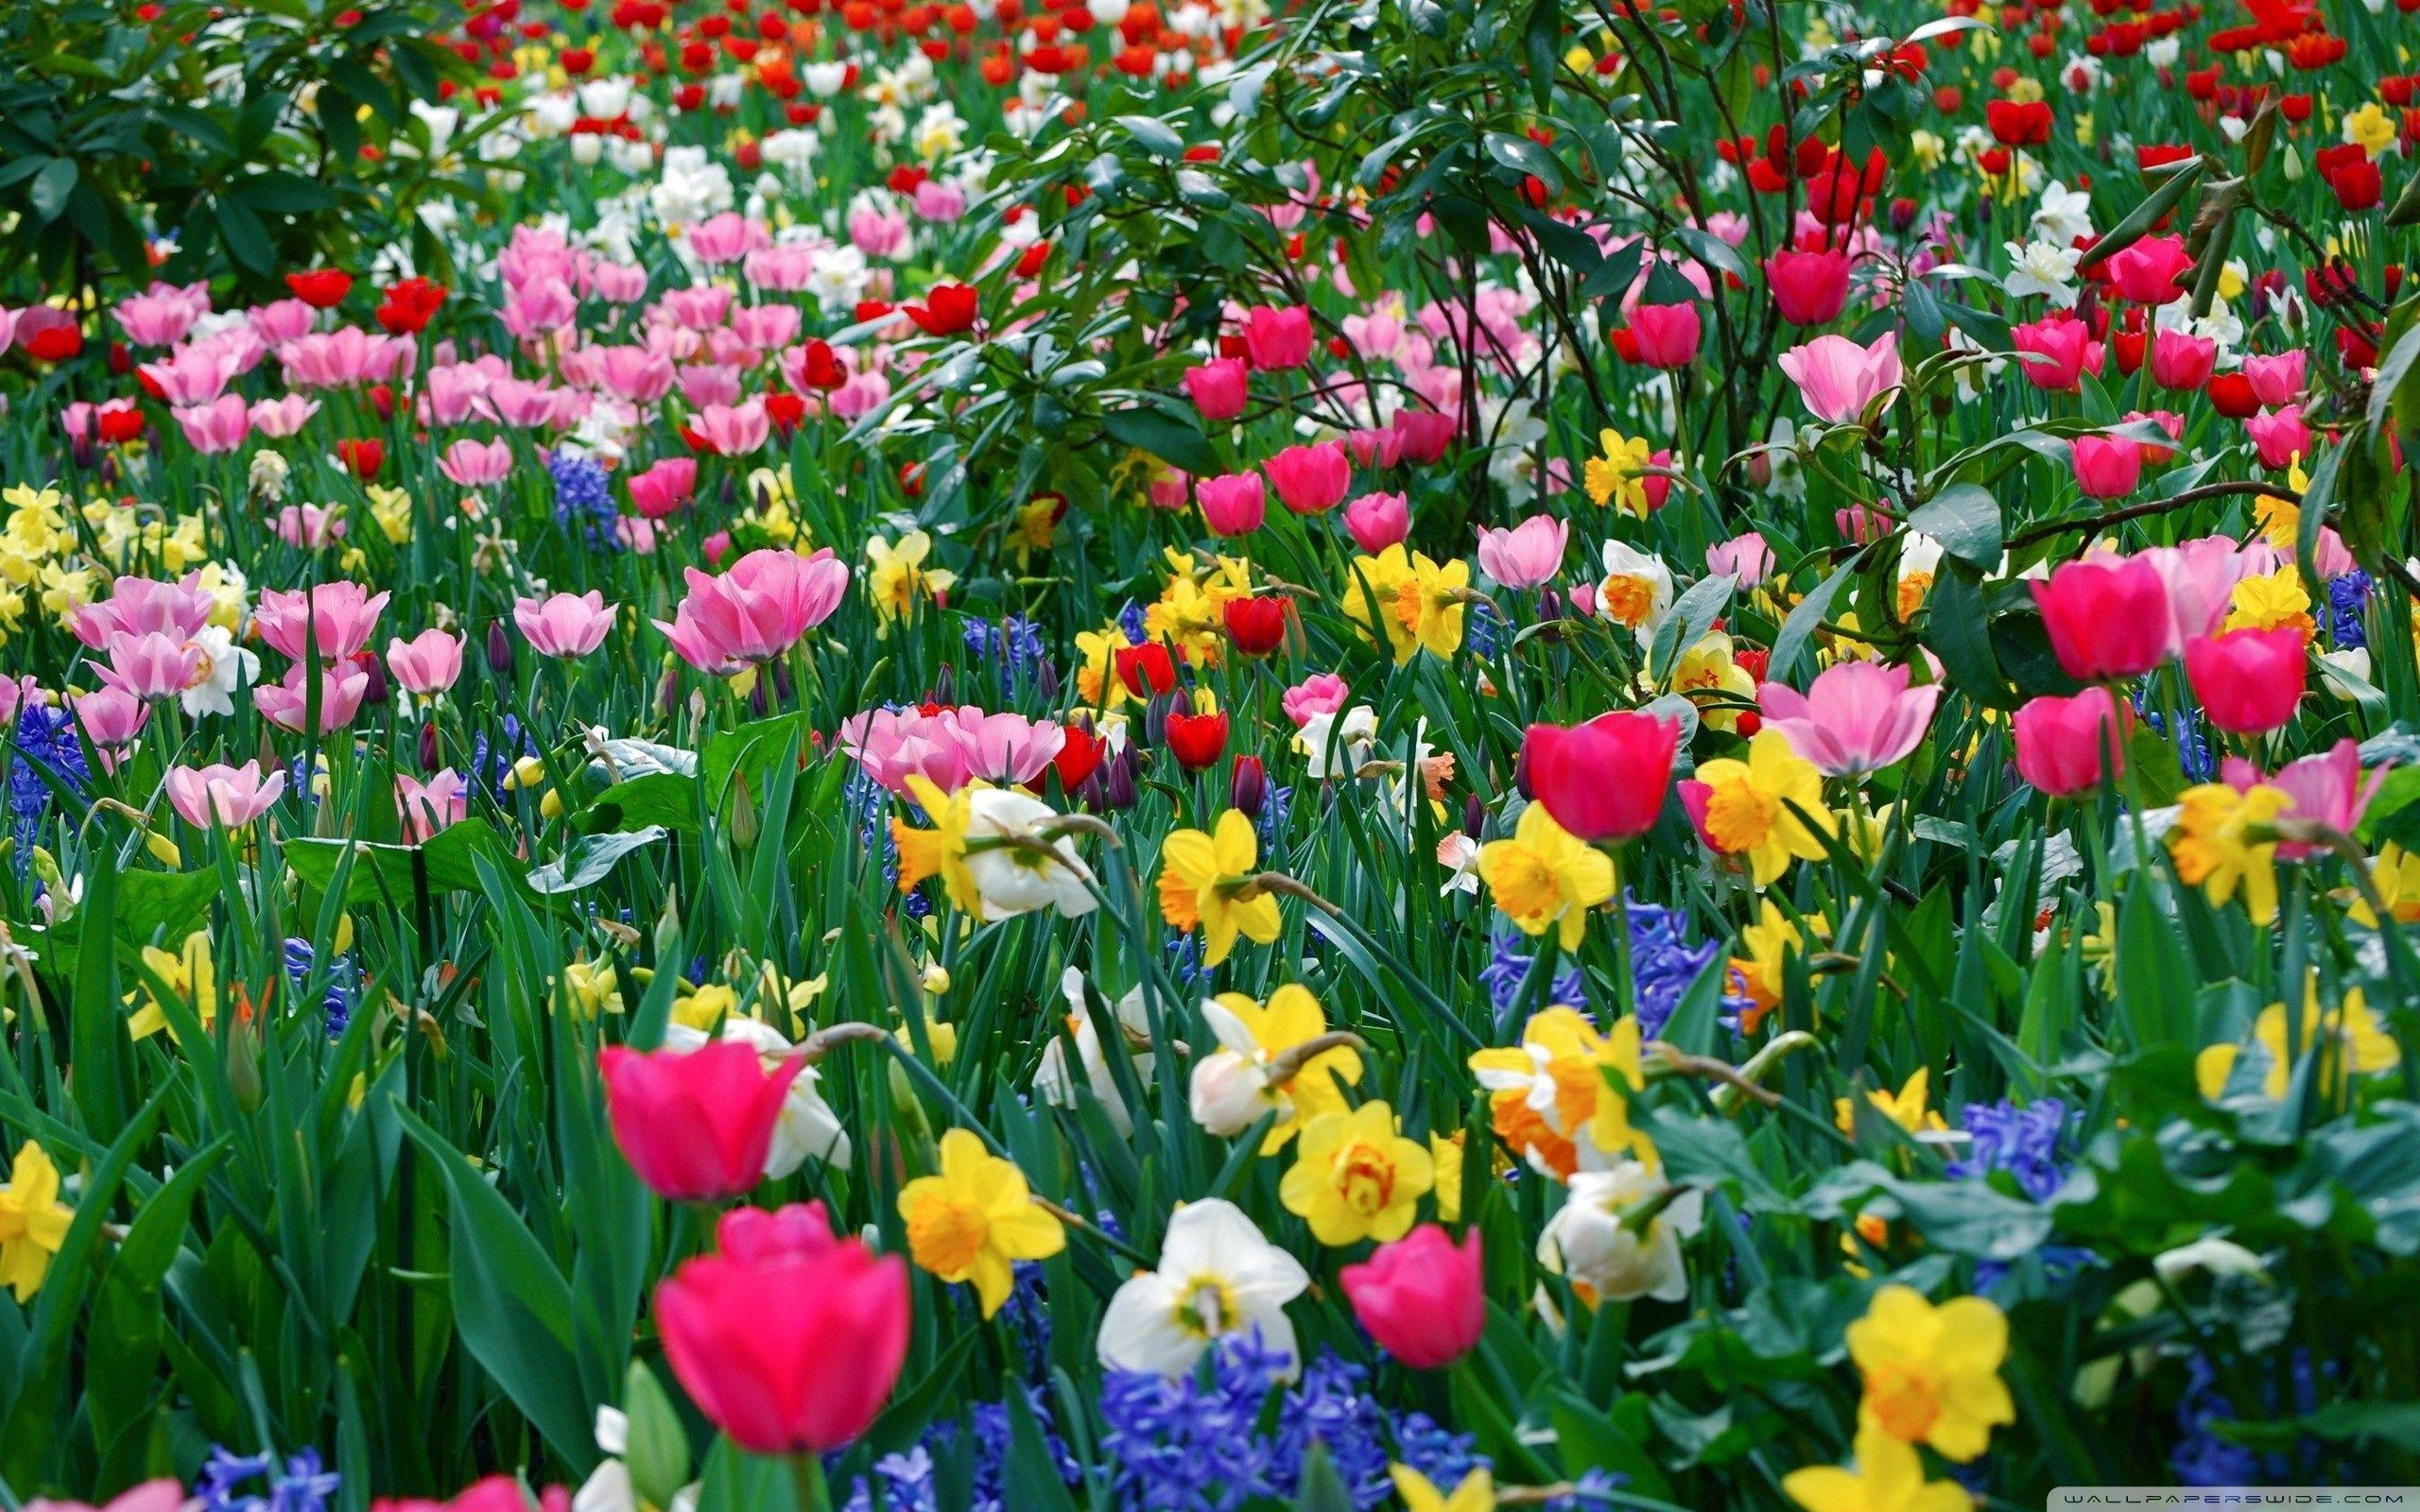 spring flowers background   spring flowers wallpaper hd desktop